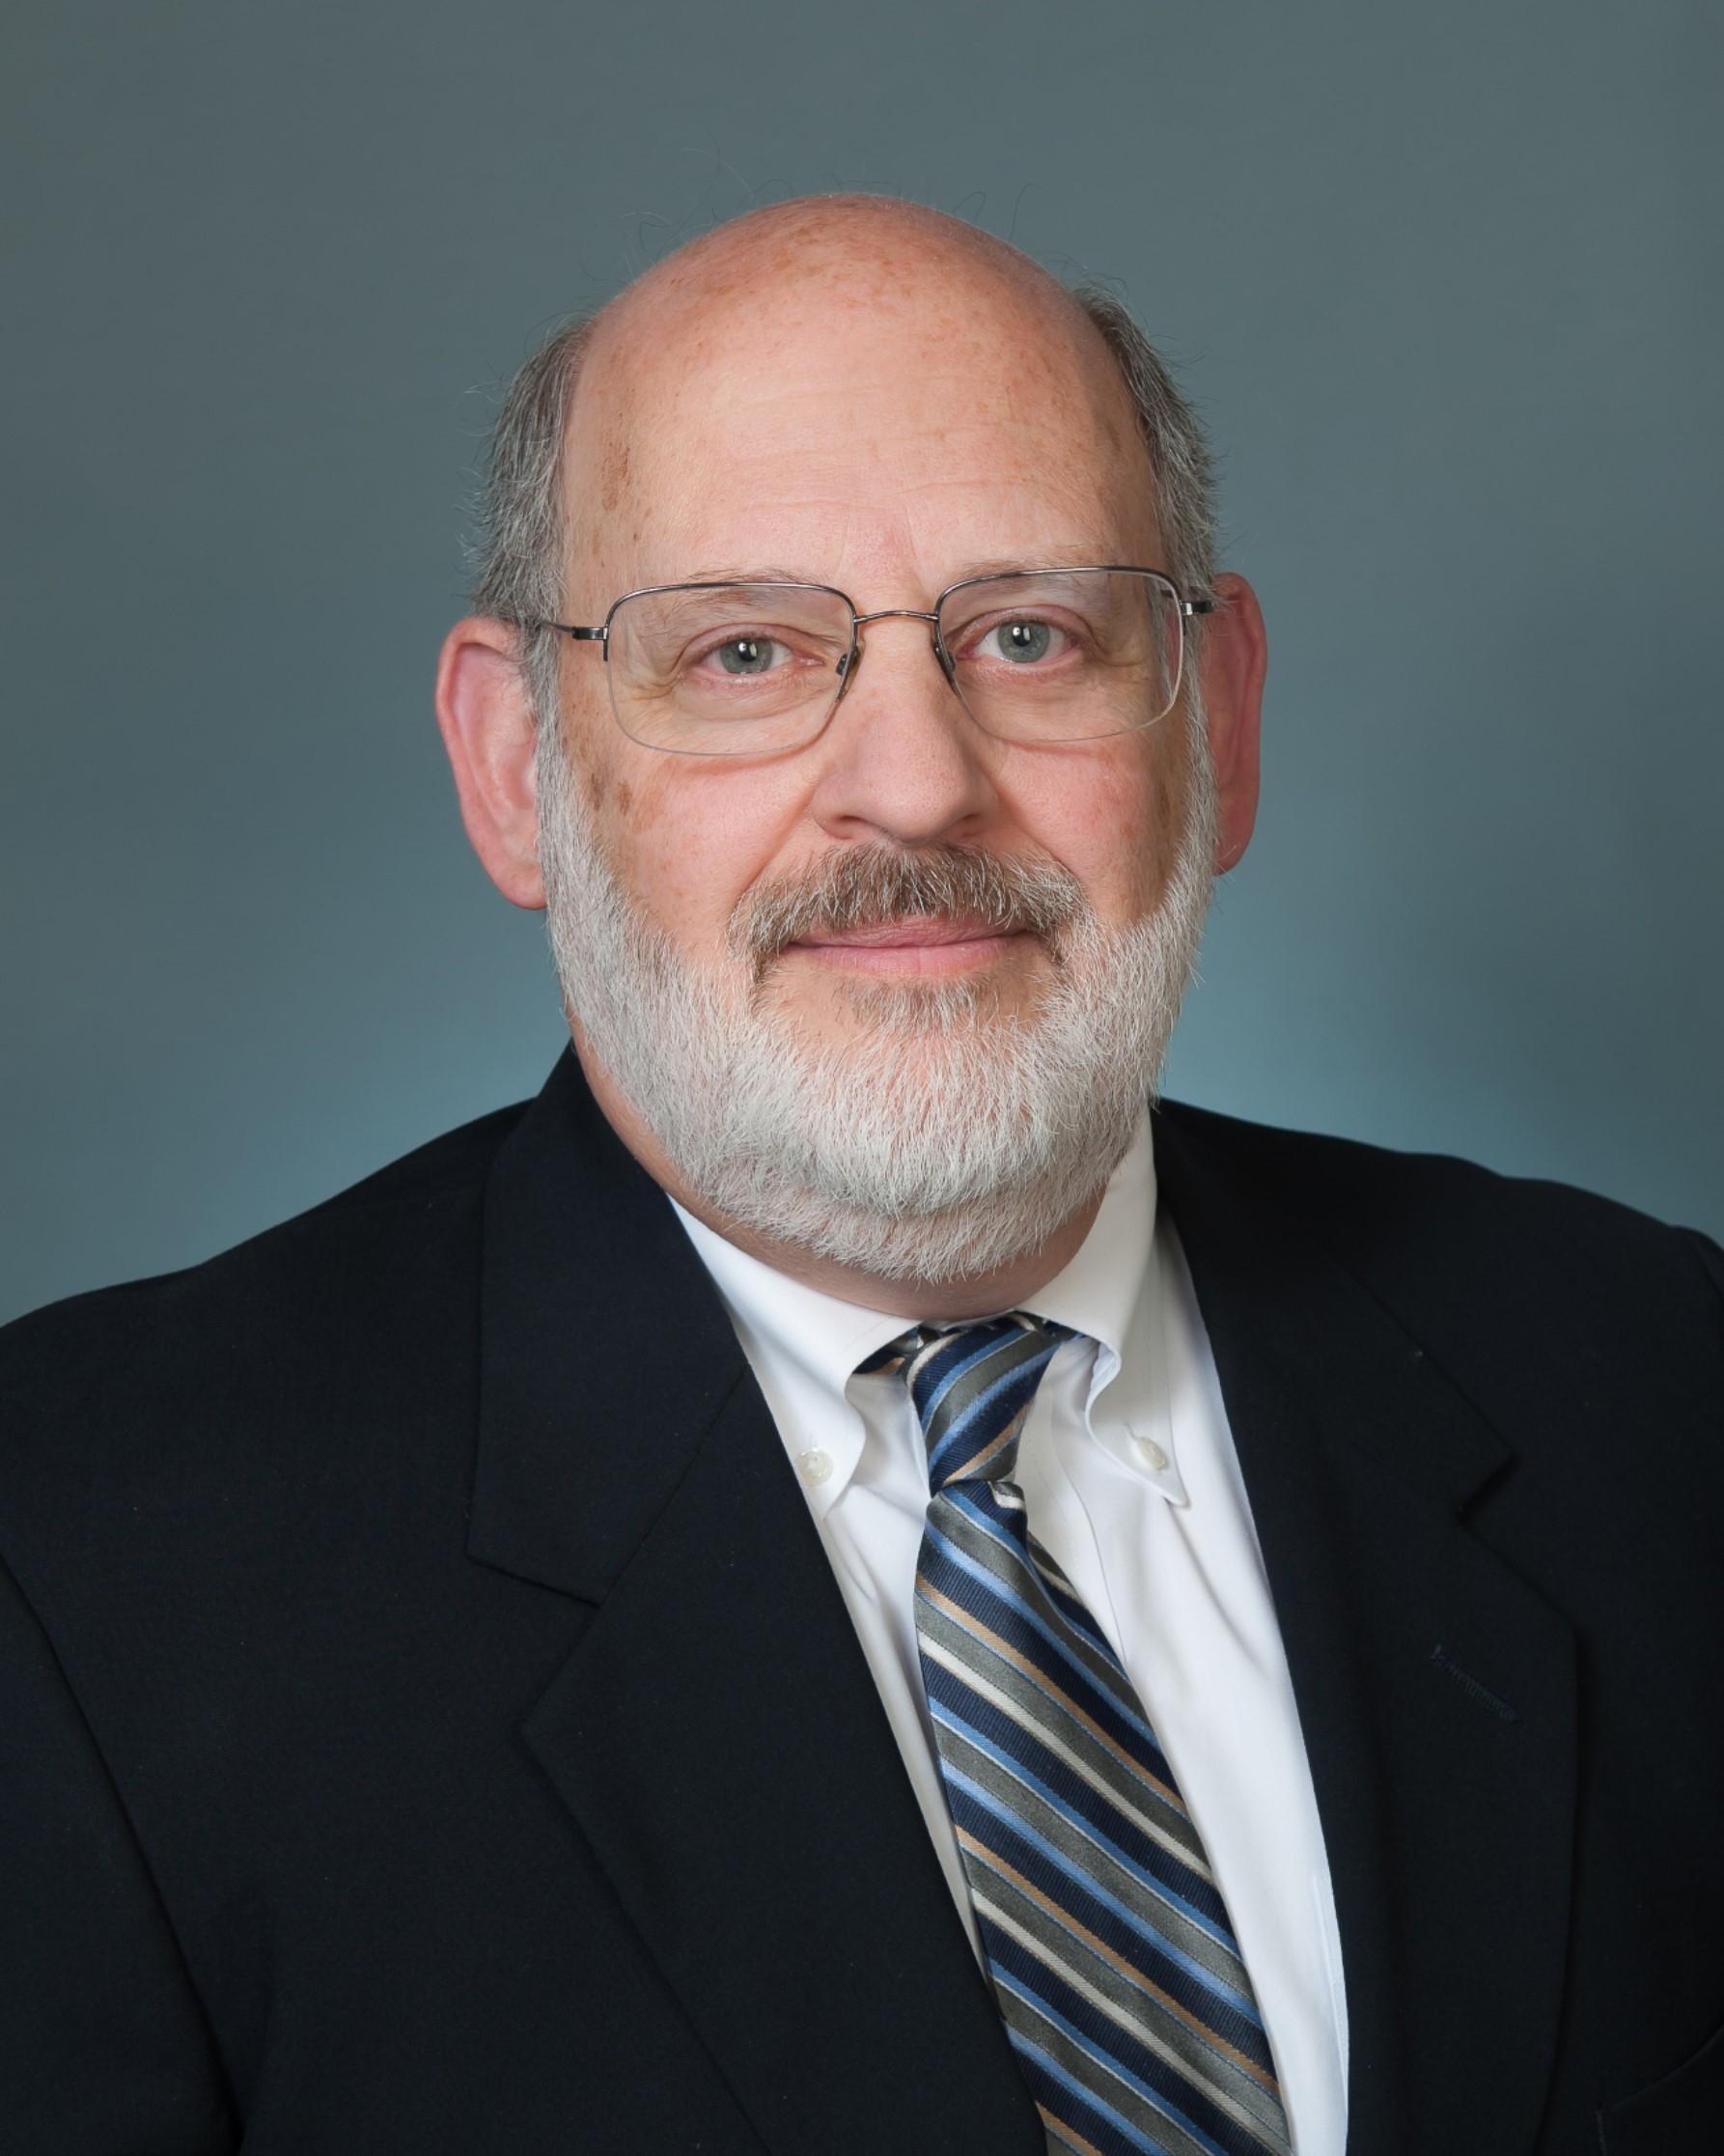 Dr.-Rosenthal-small.jpg#asset:68304